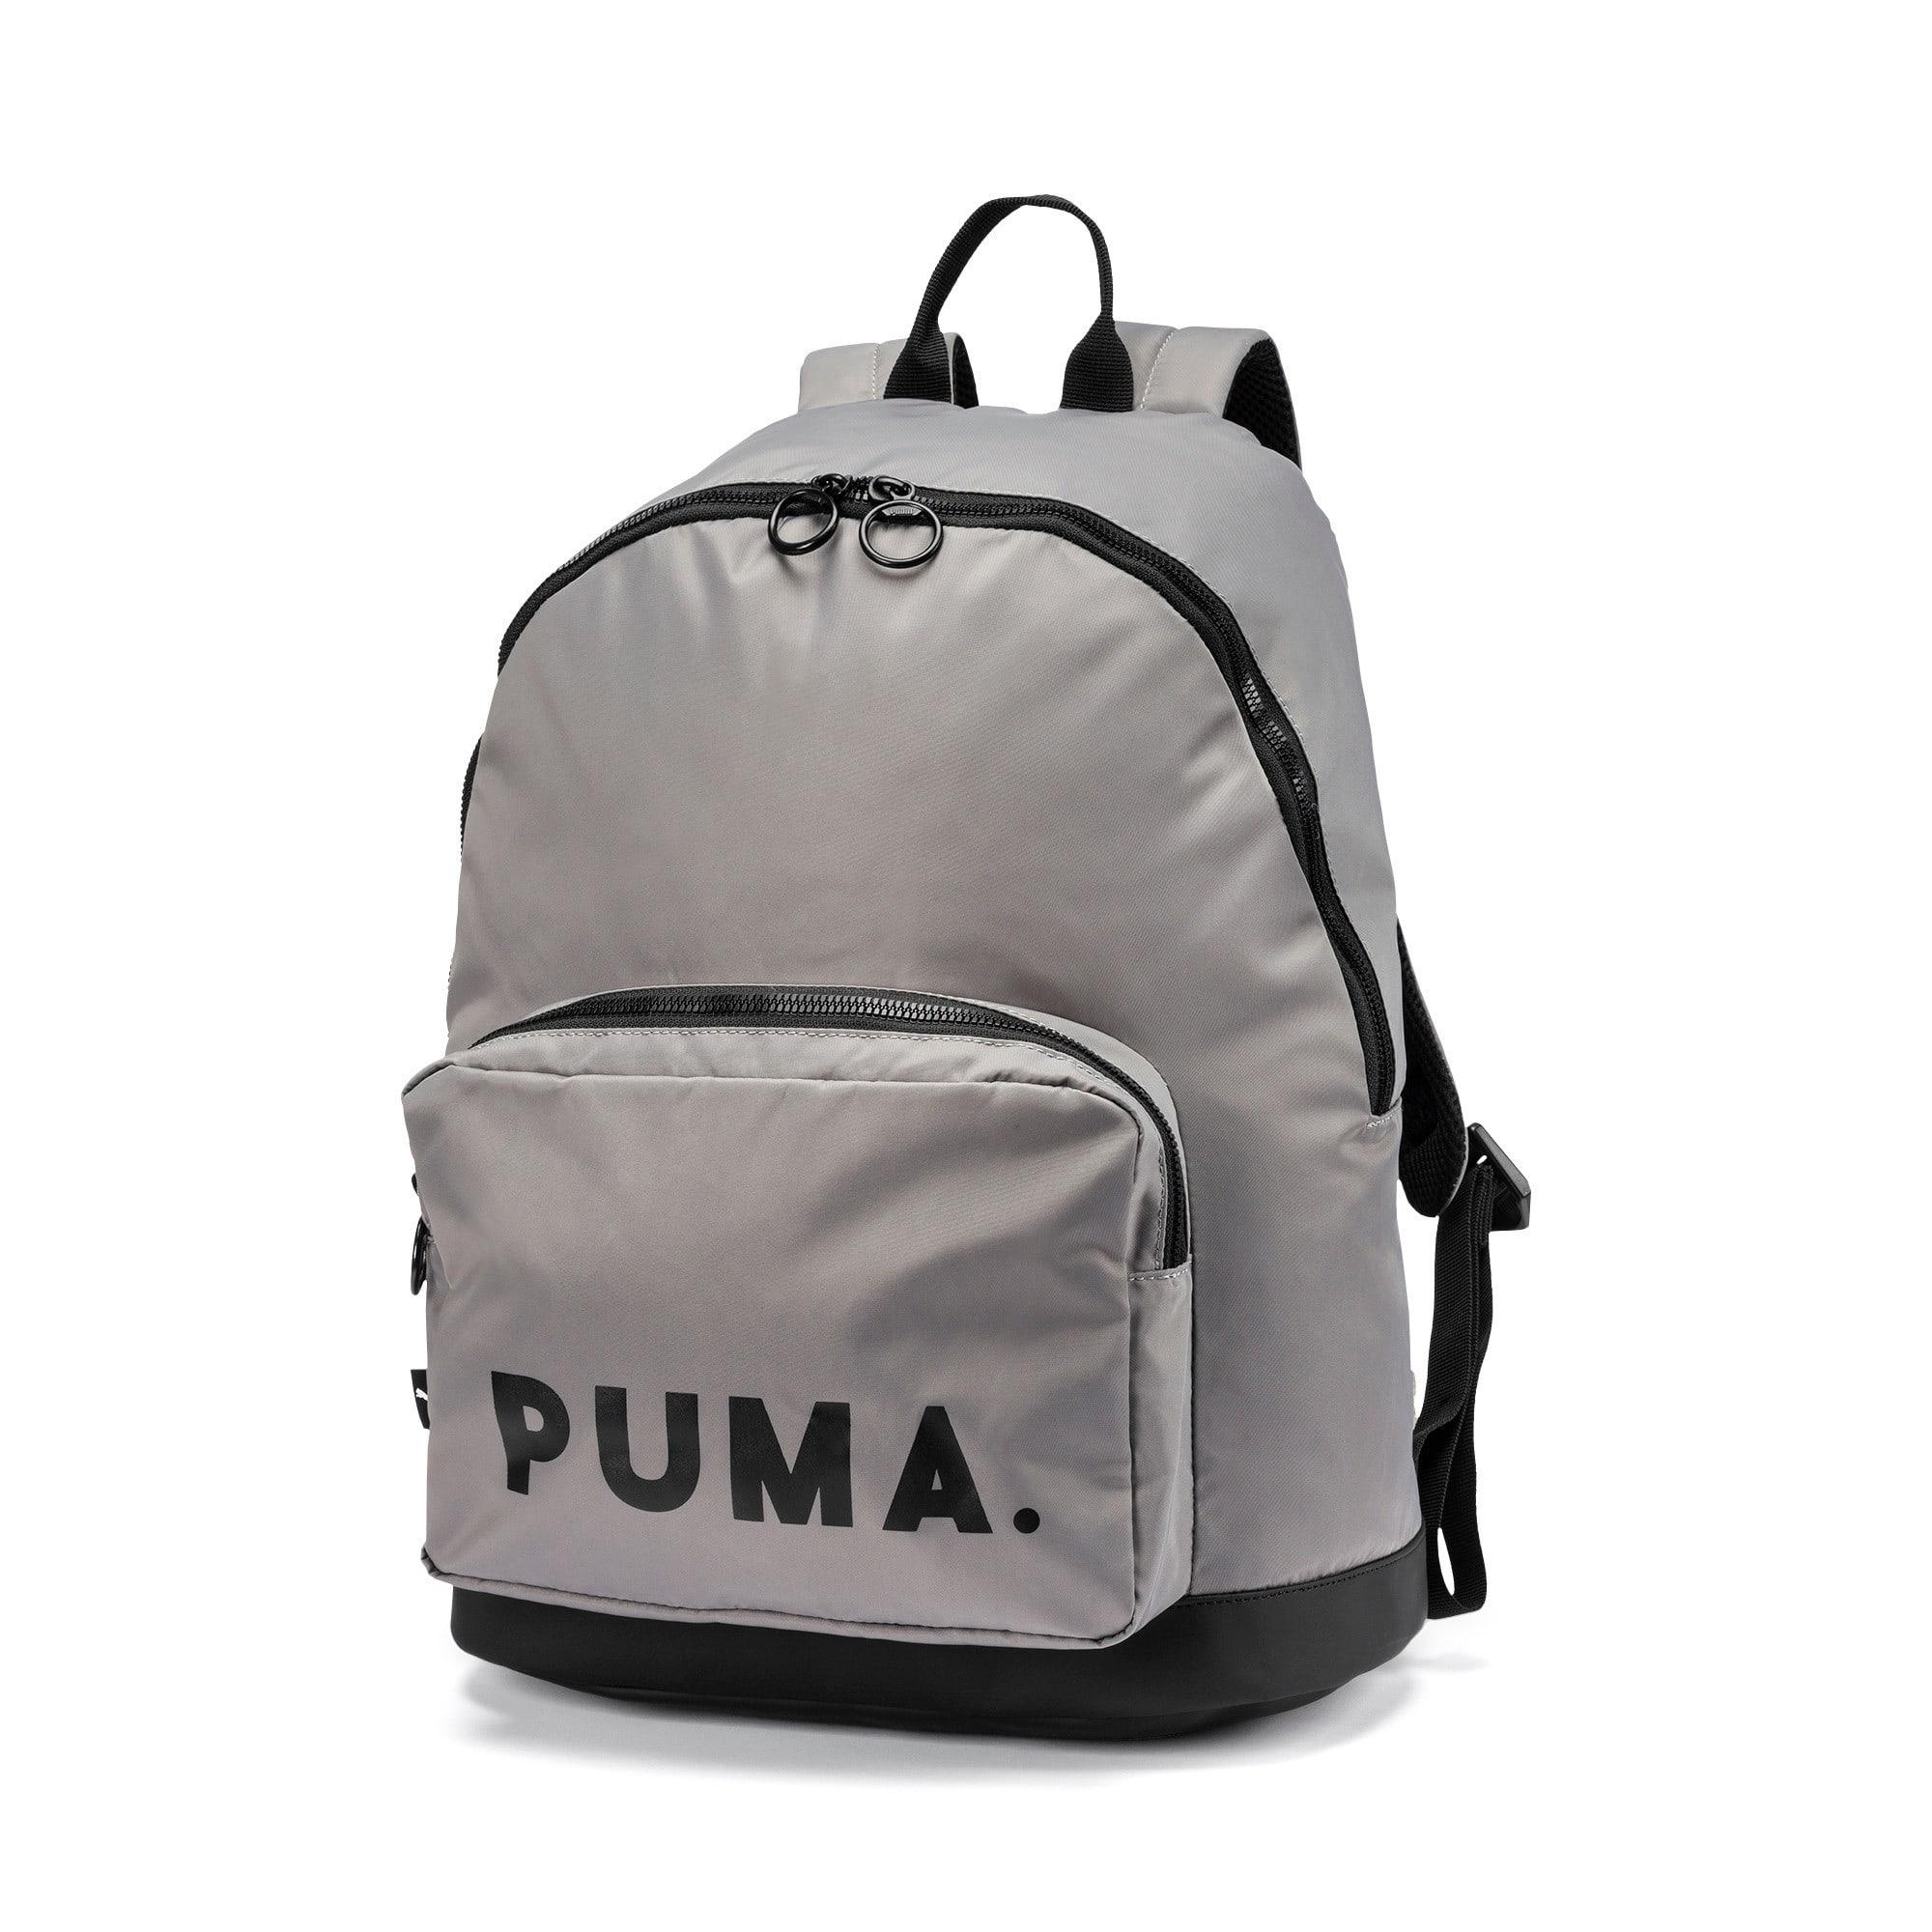 Thumbnail 1 of Originals Backpack Trend, Steel Gray-Puma Black, medium